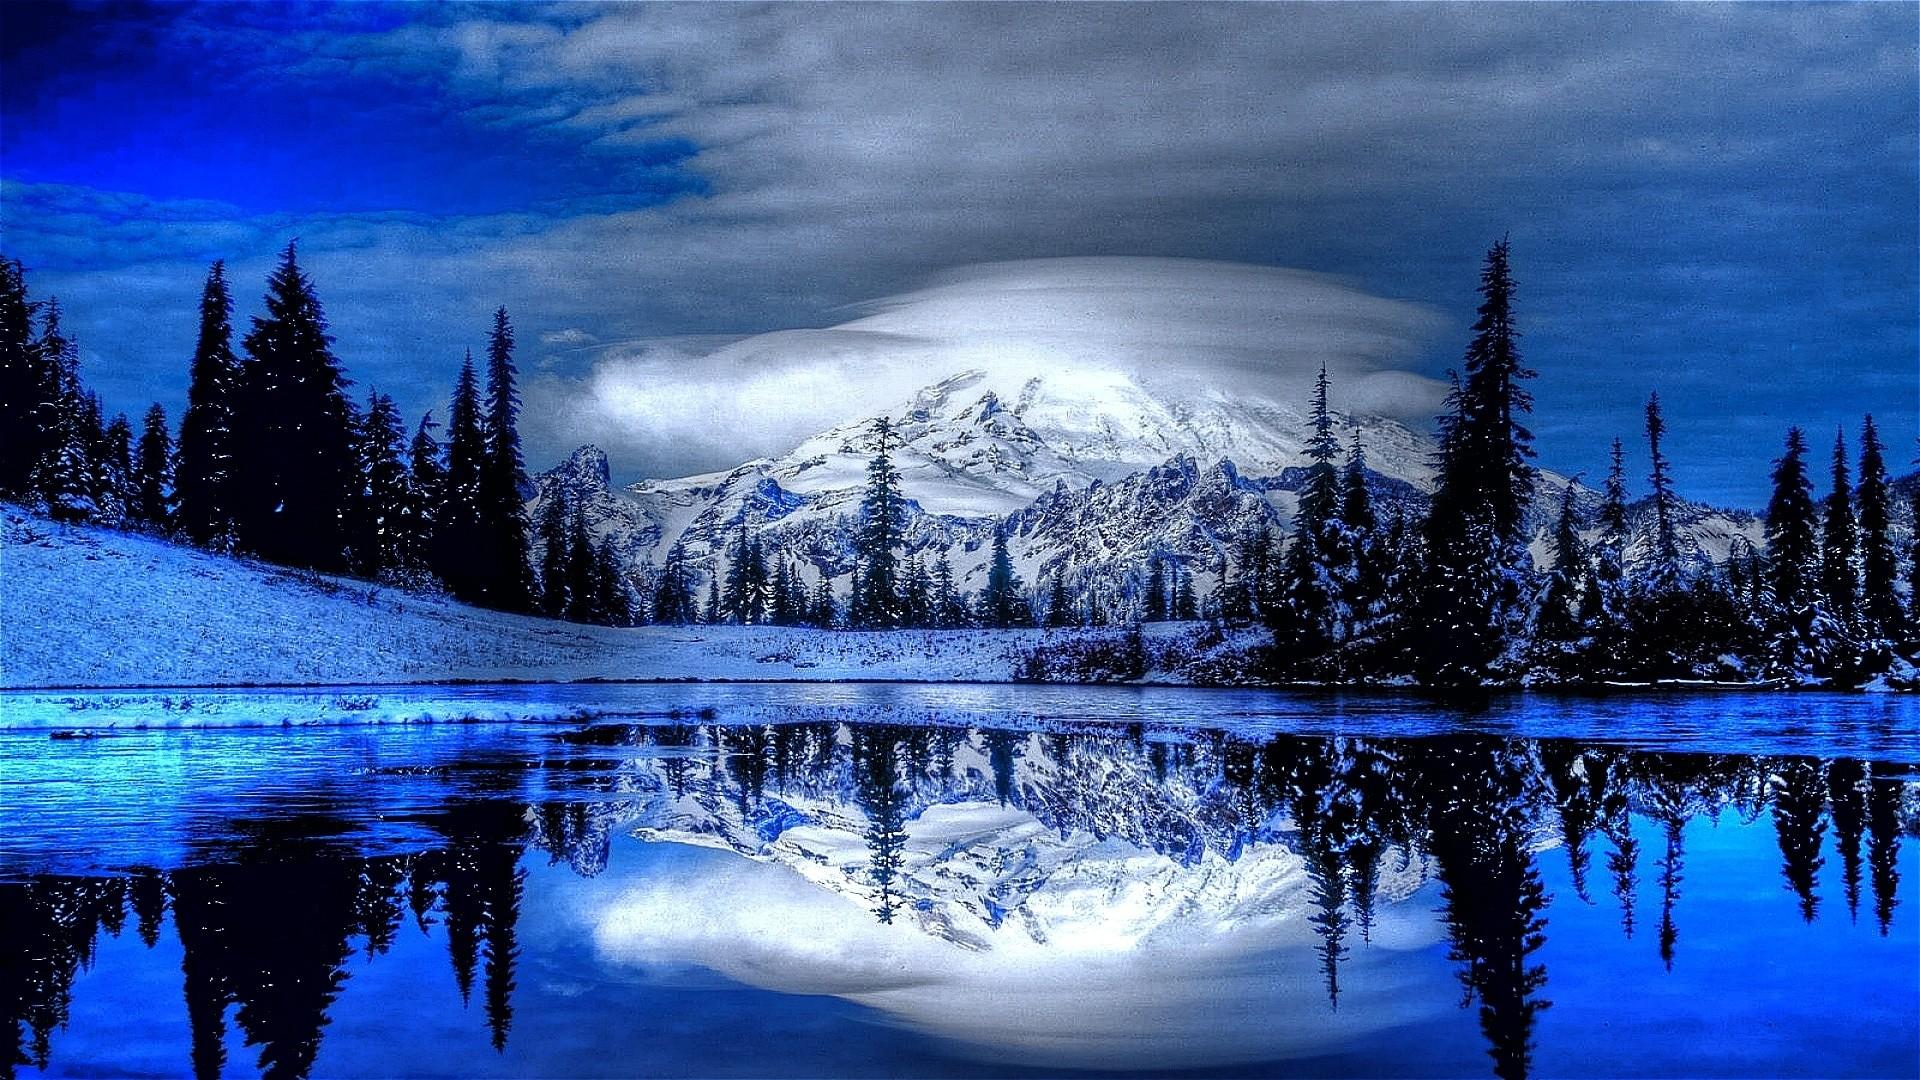 Winter HD wallpapers.